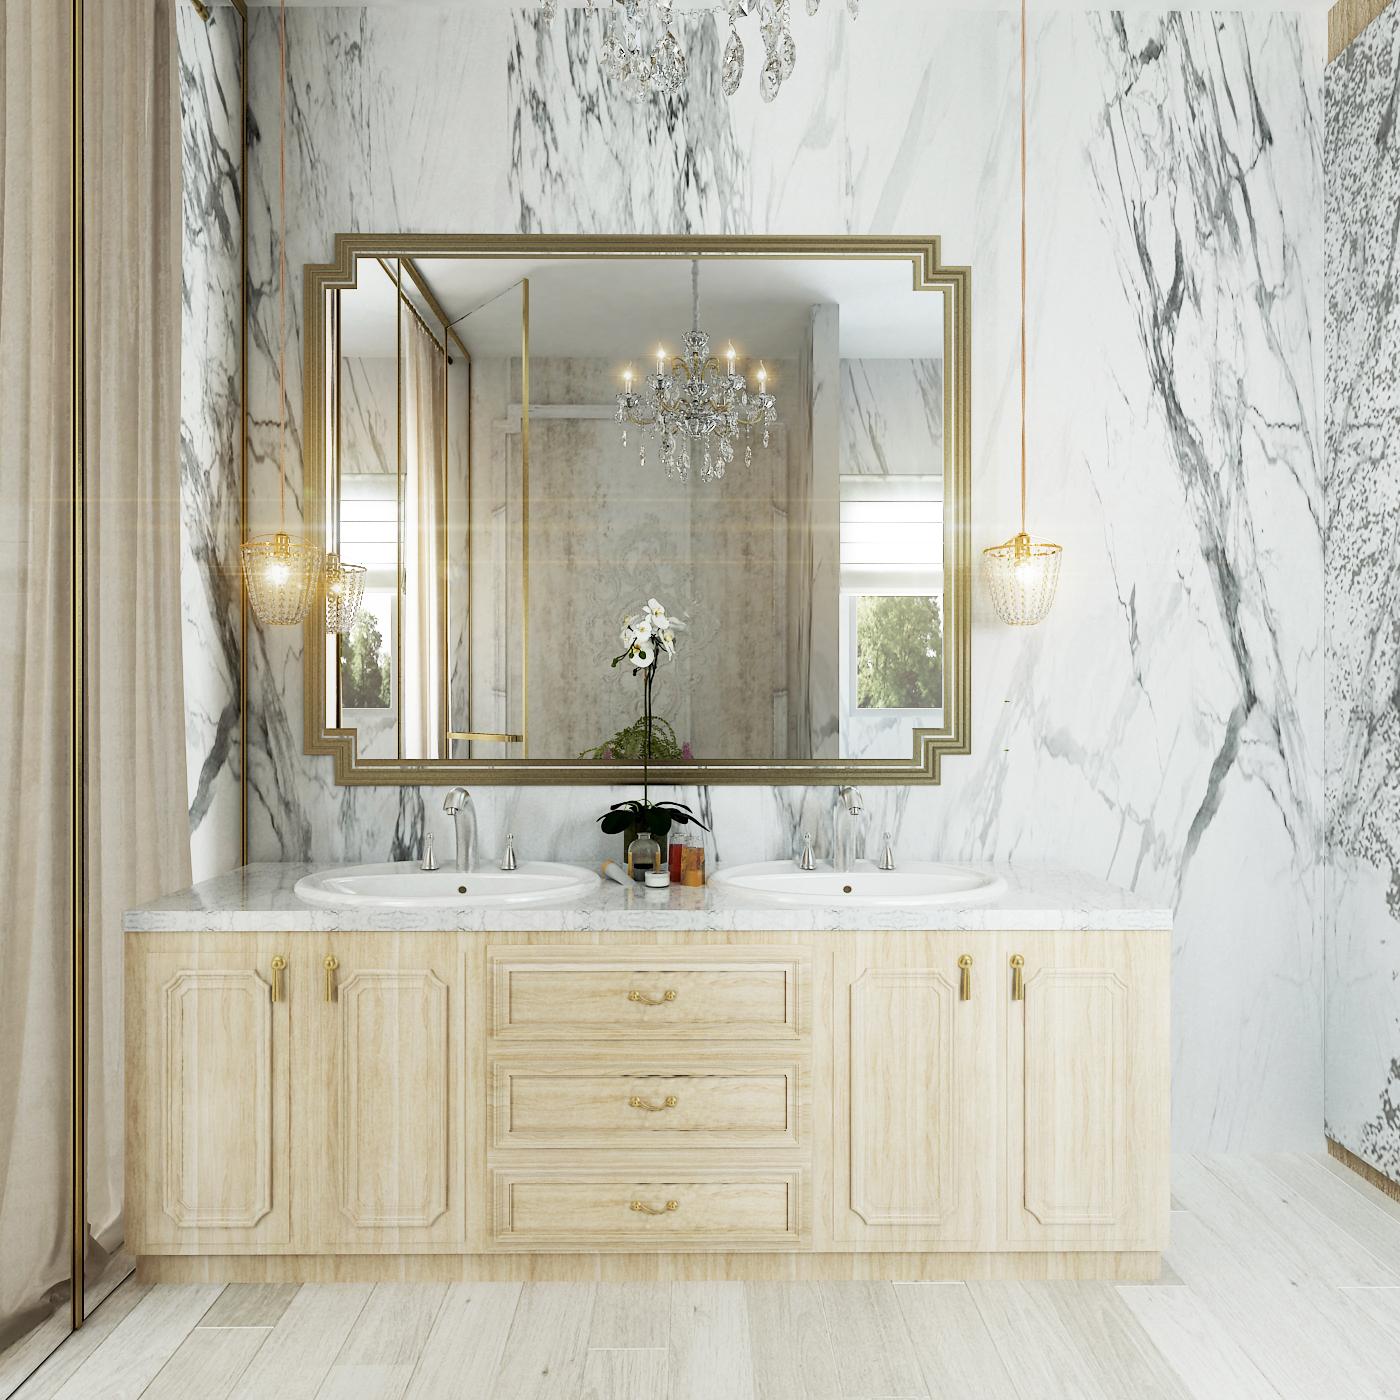 Simple Classic Master Bathroom on Behance